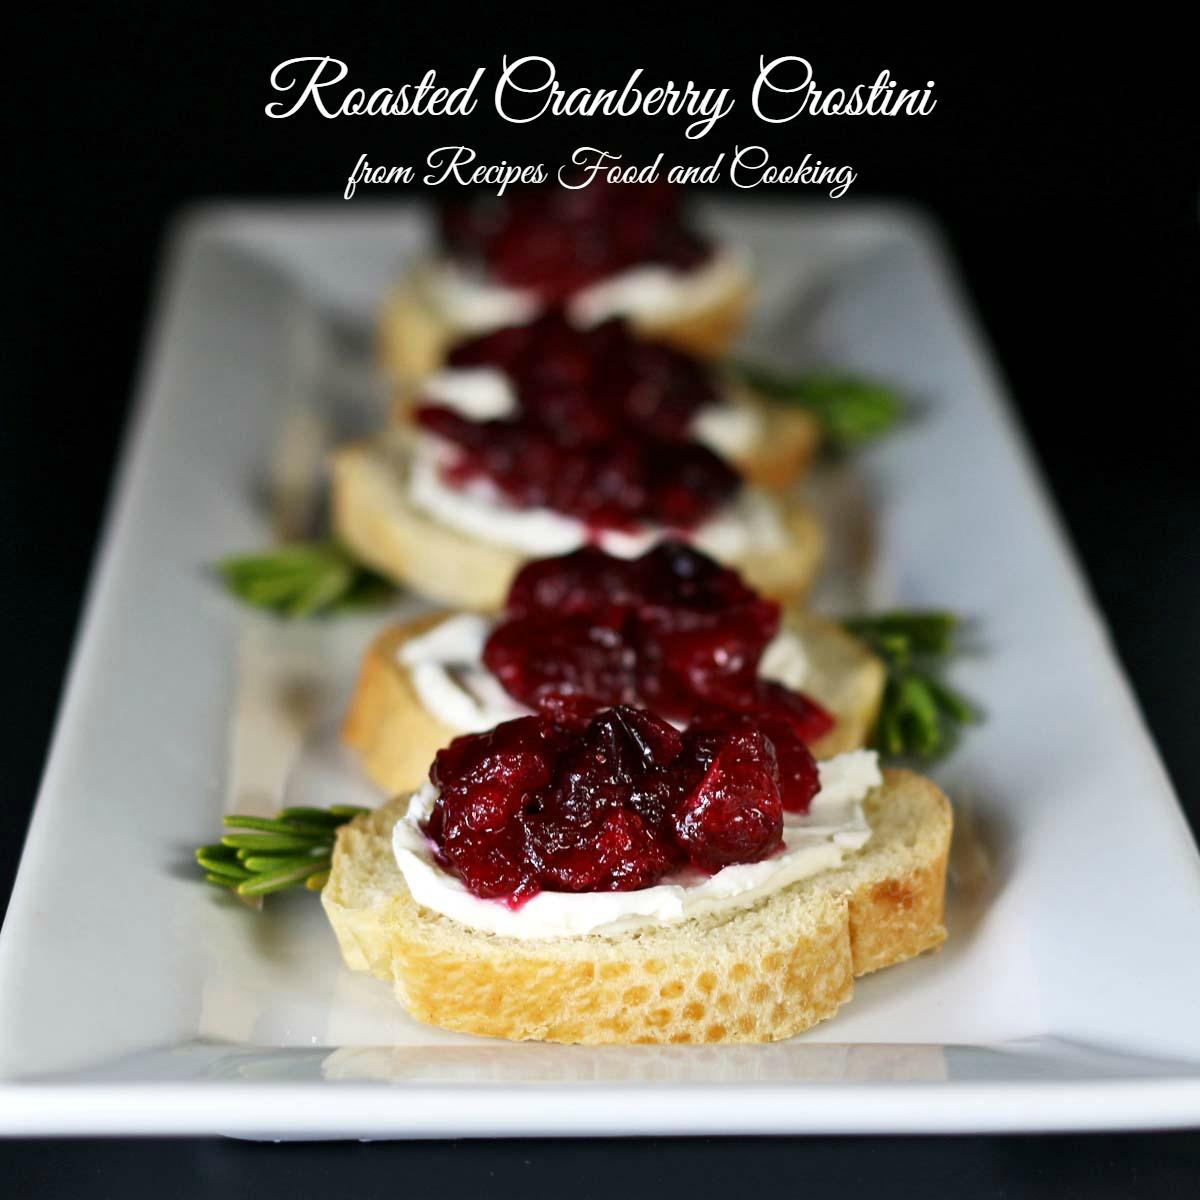 Roasted Cranberry Crostini